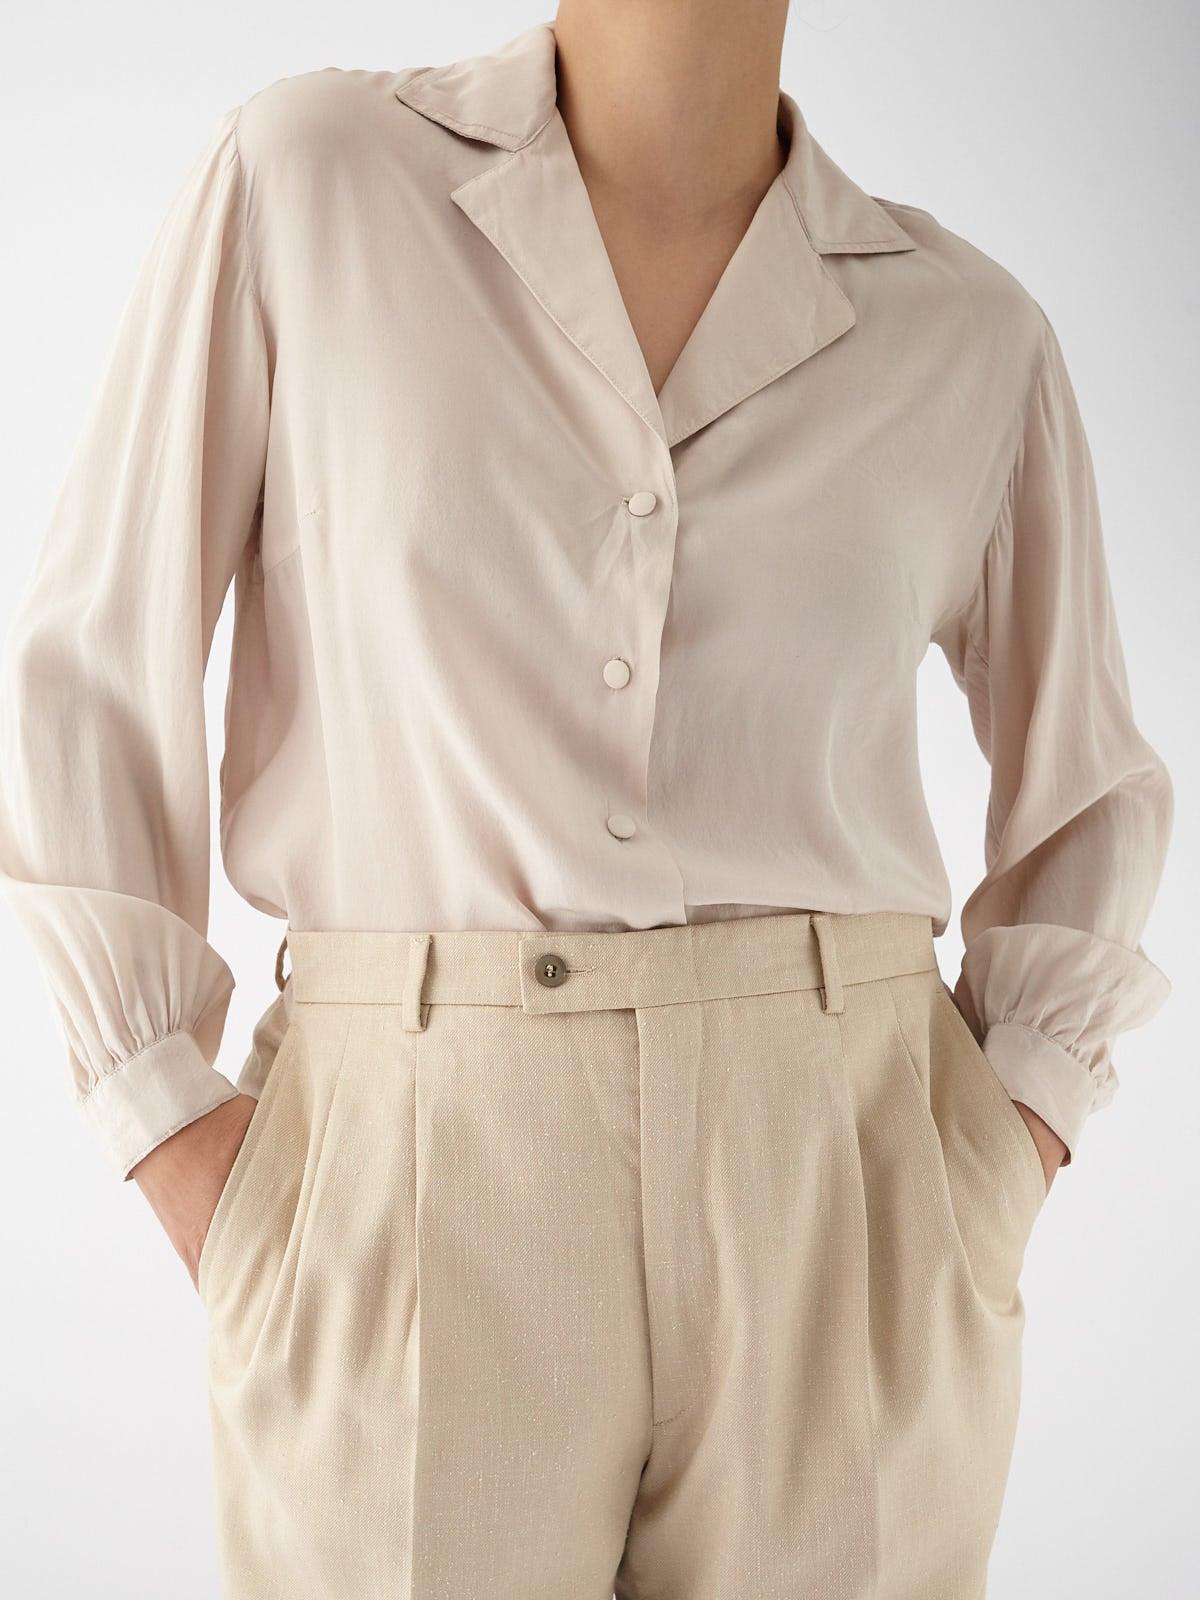 Lapel Shirt